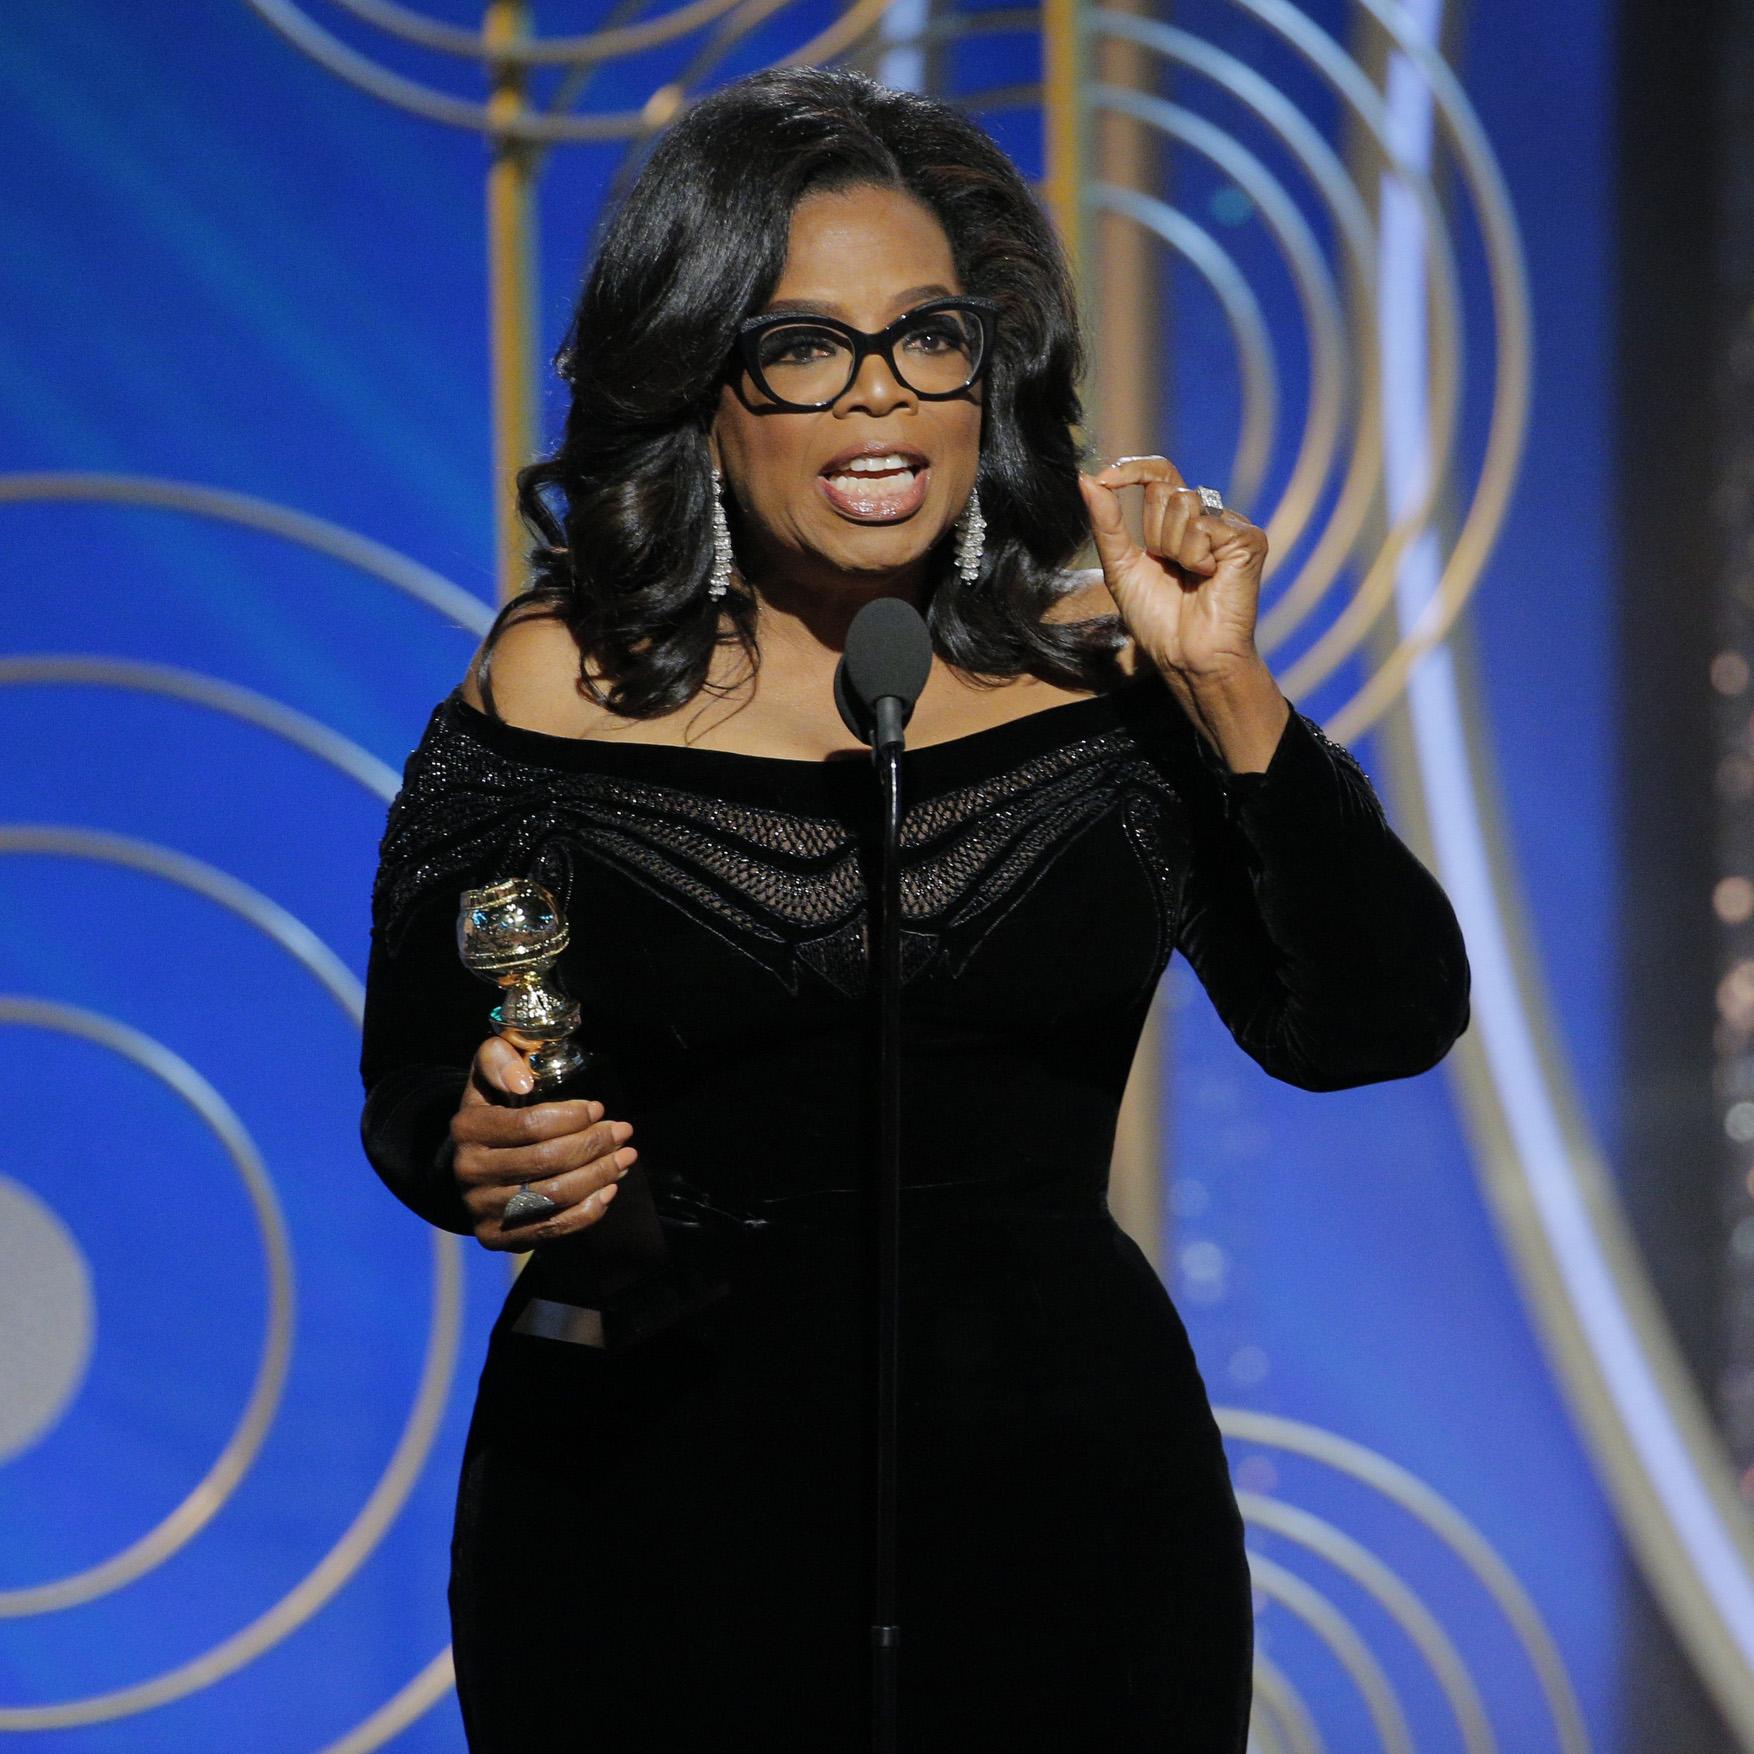 Oprah Winfrey Golden Globes Getty Images